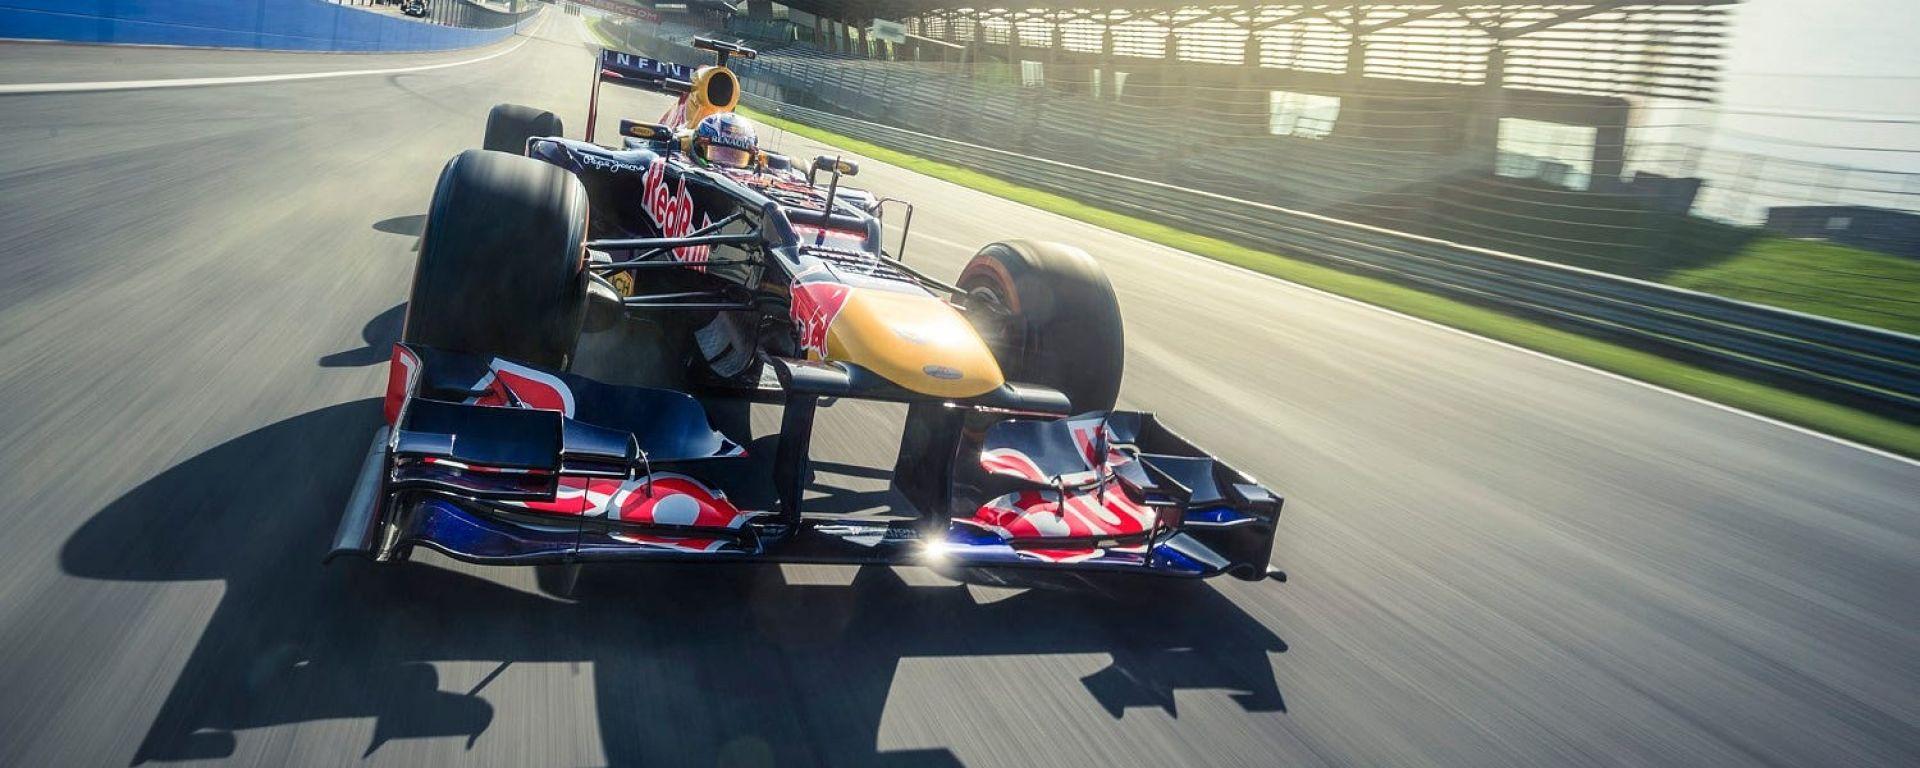 Gran Premio d'Austria